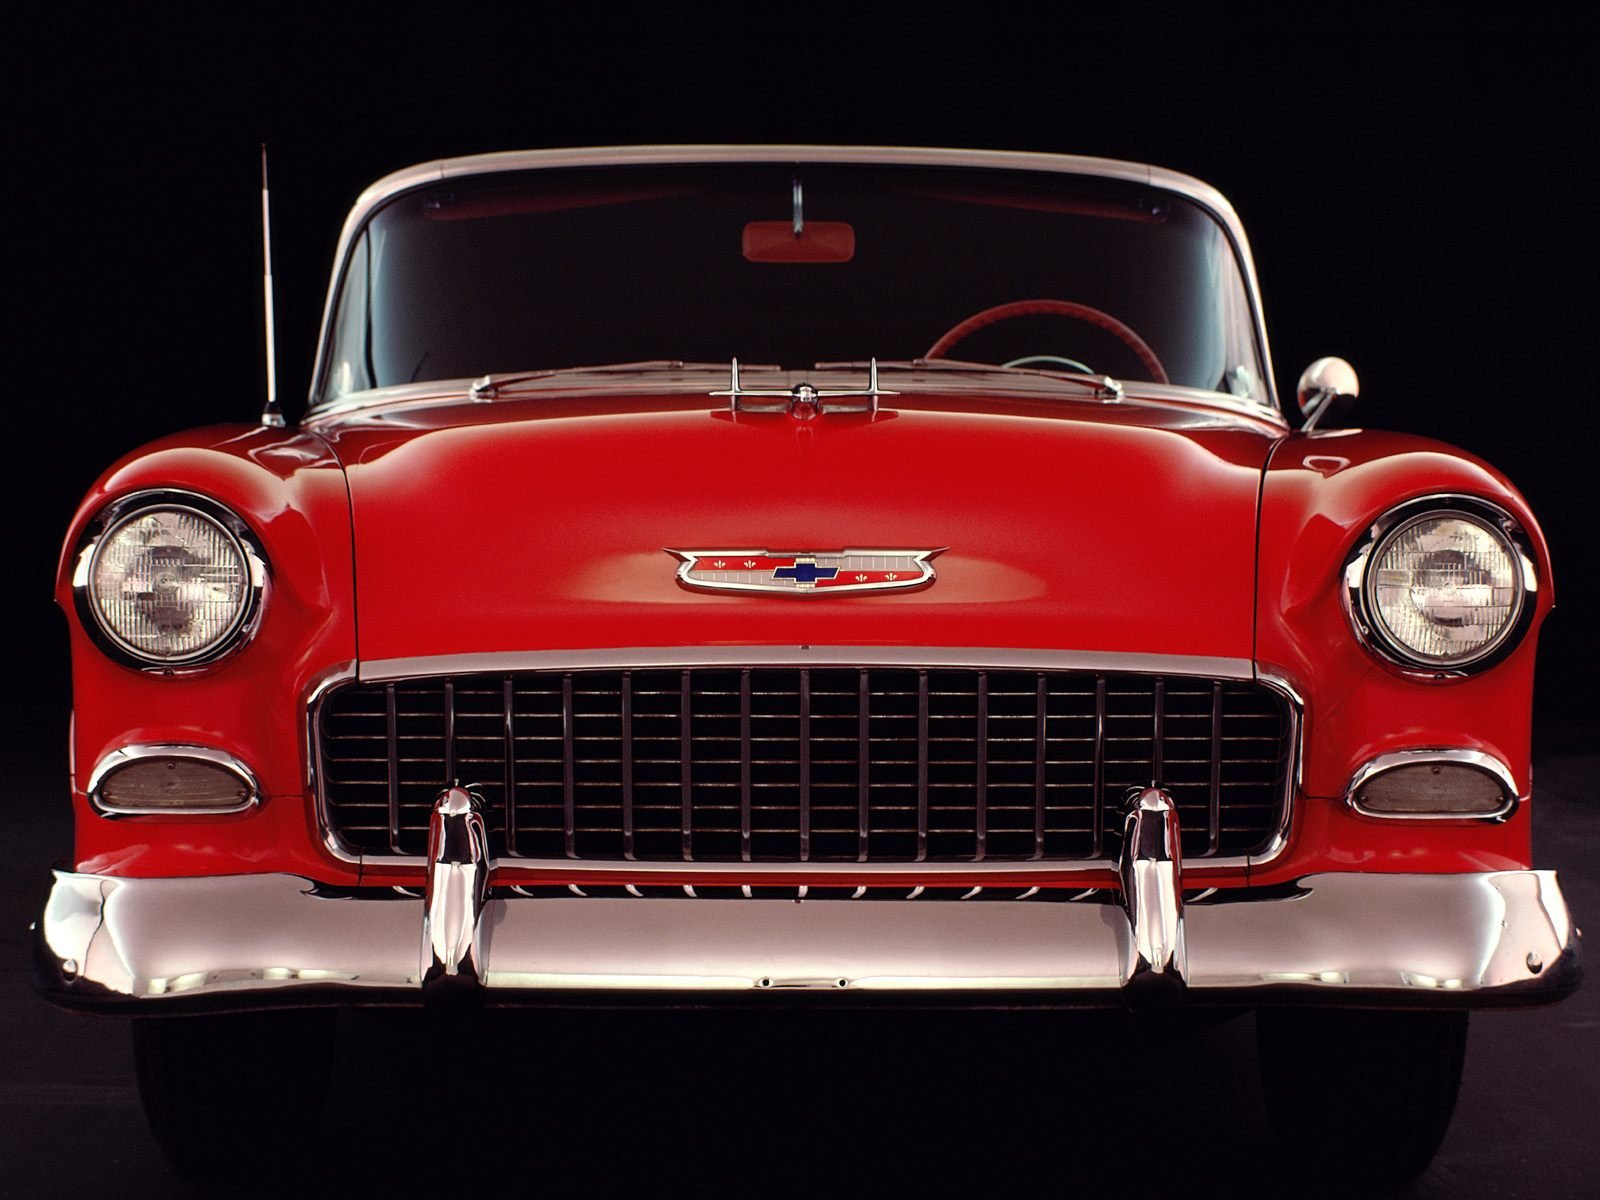 1955 Chevrolet Bel Air wallpaper   Car wallpapers   wallpapers 1600x1200